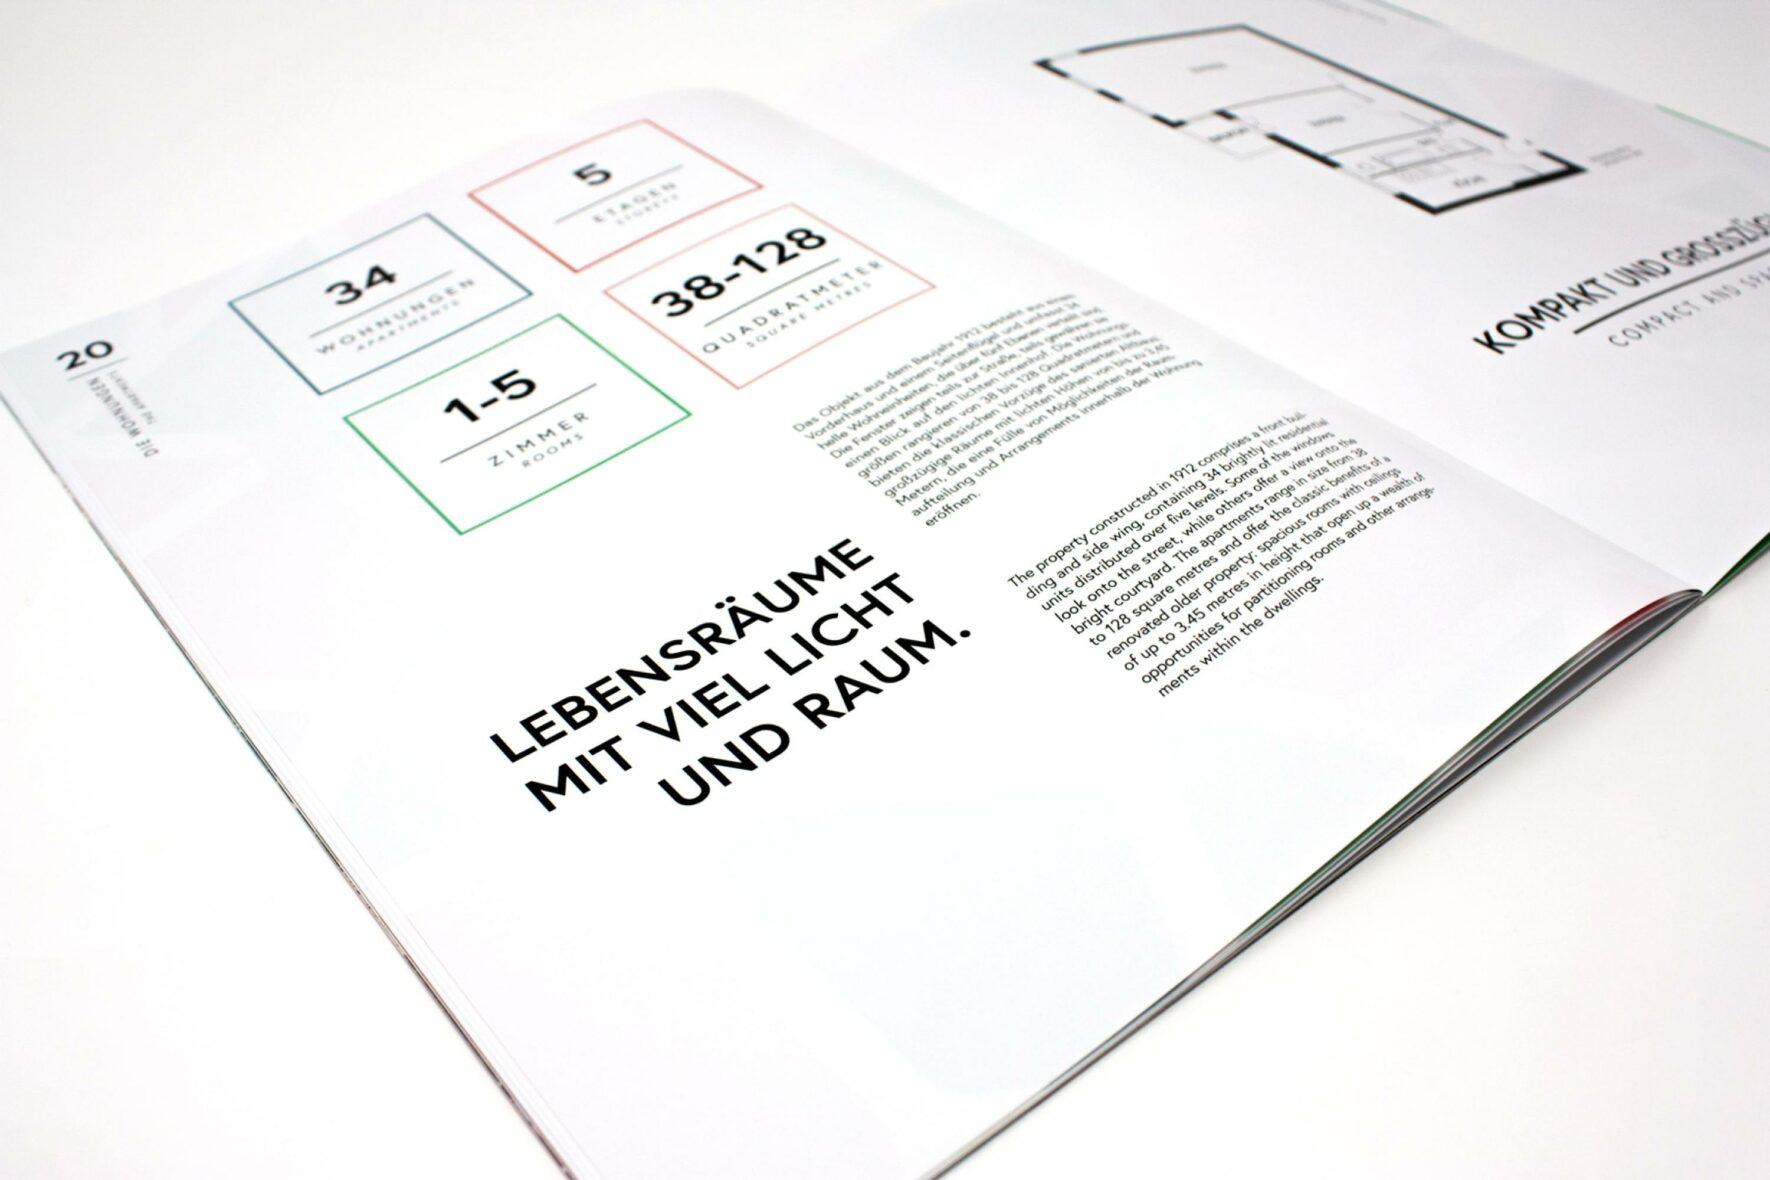 Broschuere-Osloer-Immobilienbranding-Trendcity-FORMLOS-berlin-24